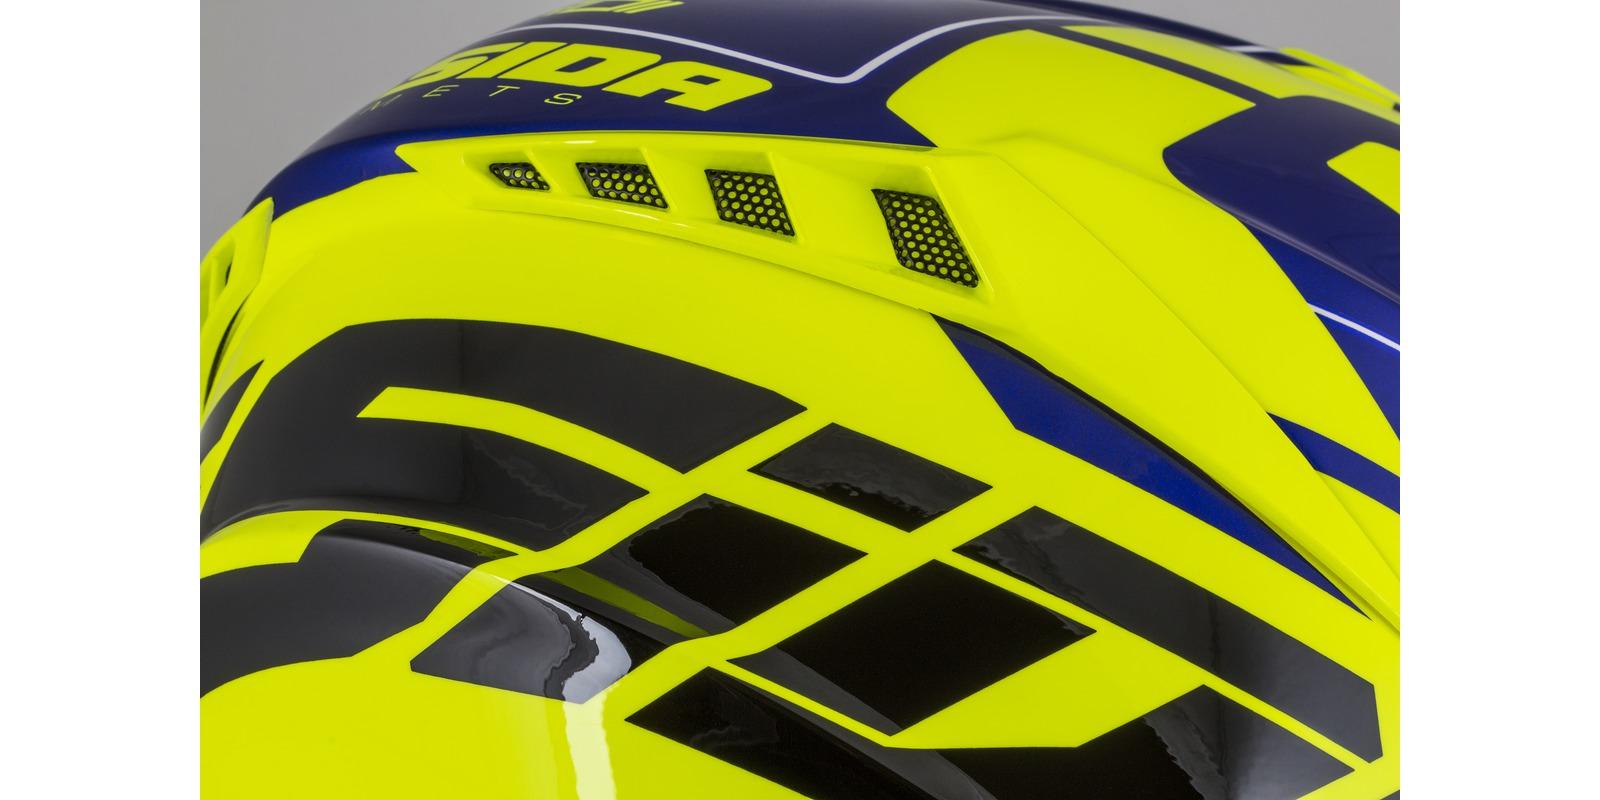 přilba Cross Pro II Contra, CASSIDA (žlutá fluo/modrá perleť/černá/bílá)